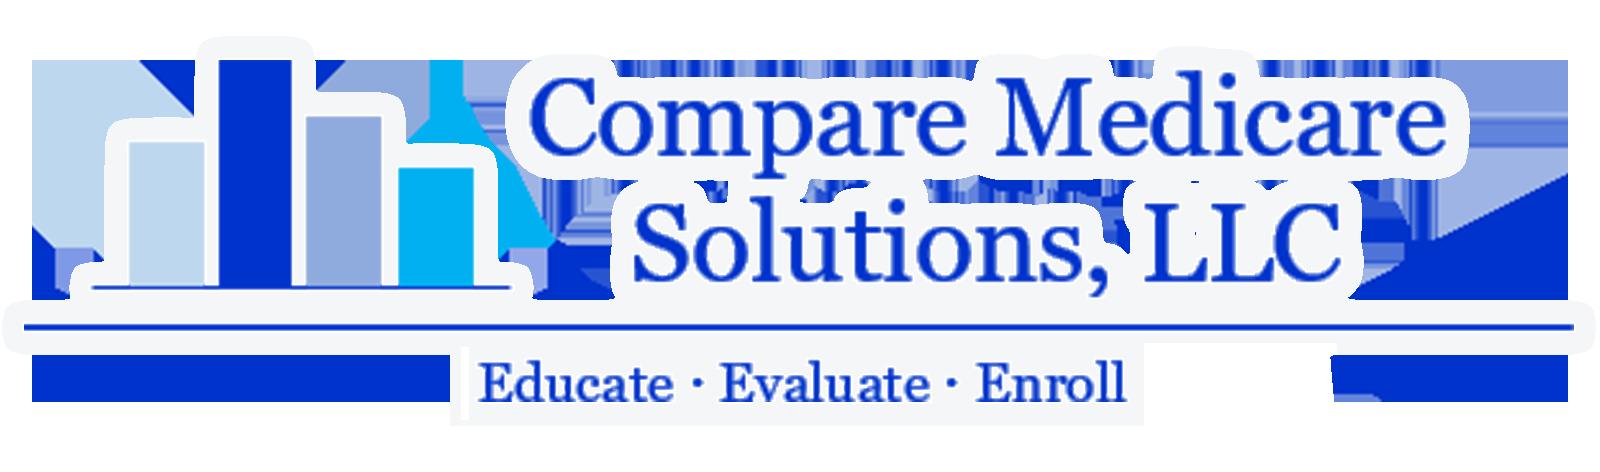 Compare Medicare Solutions